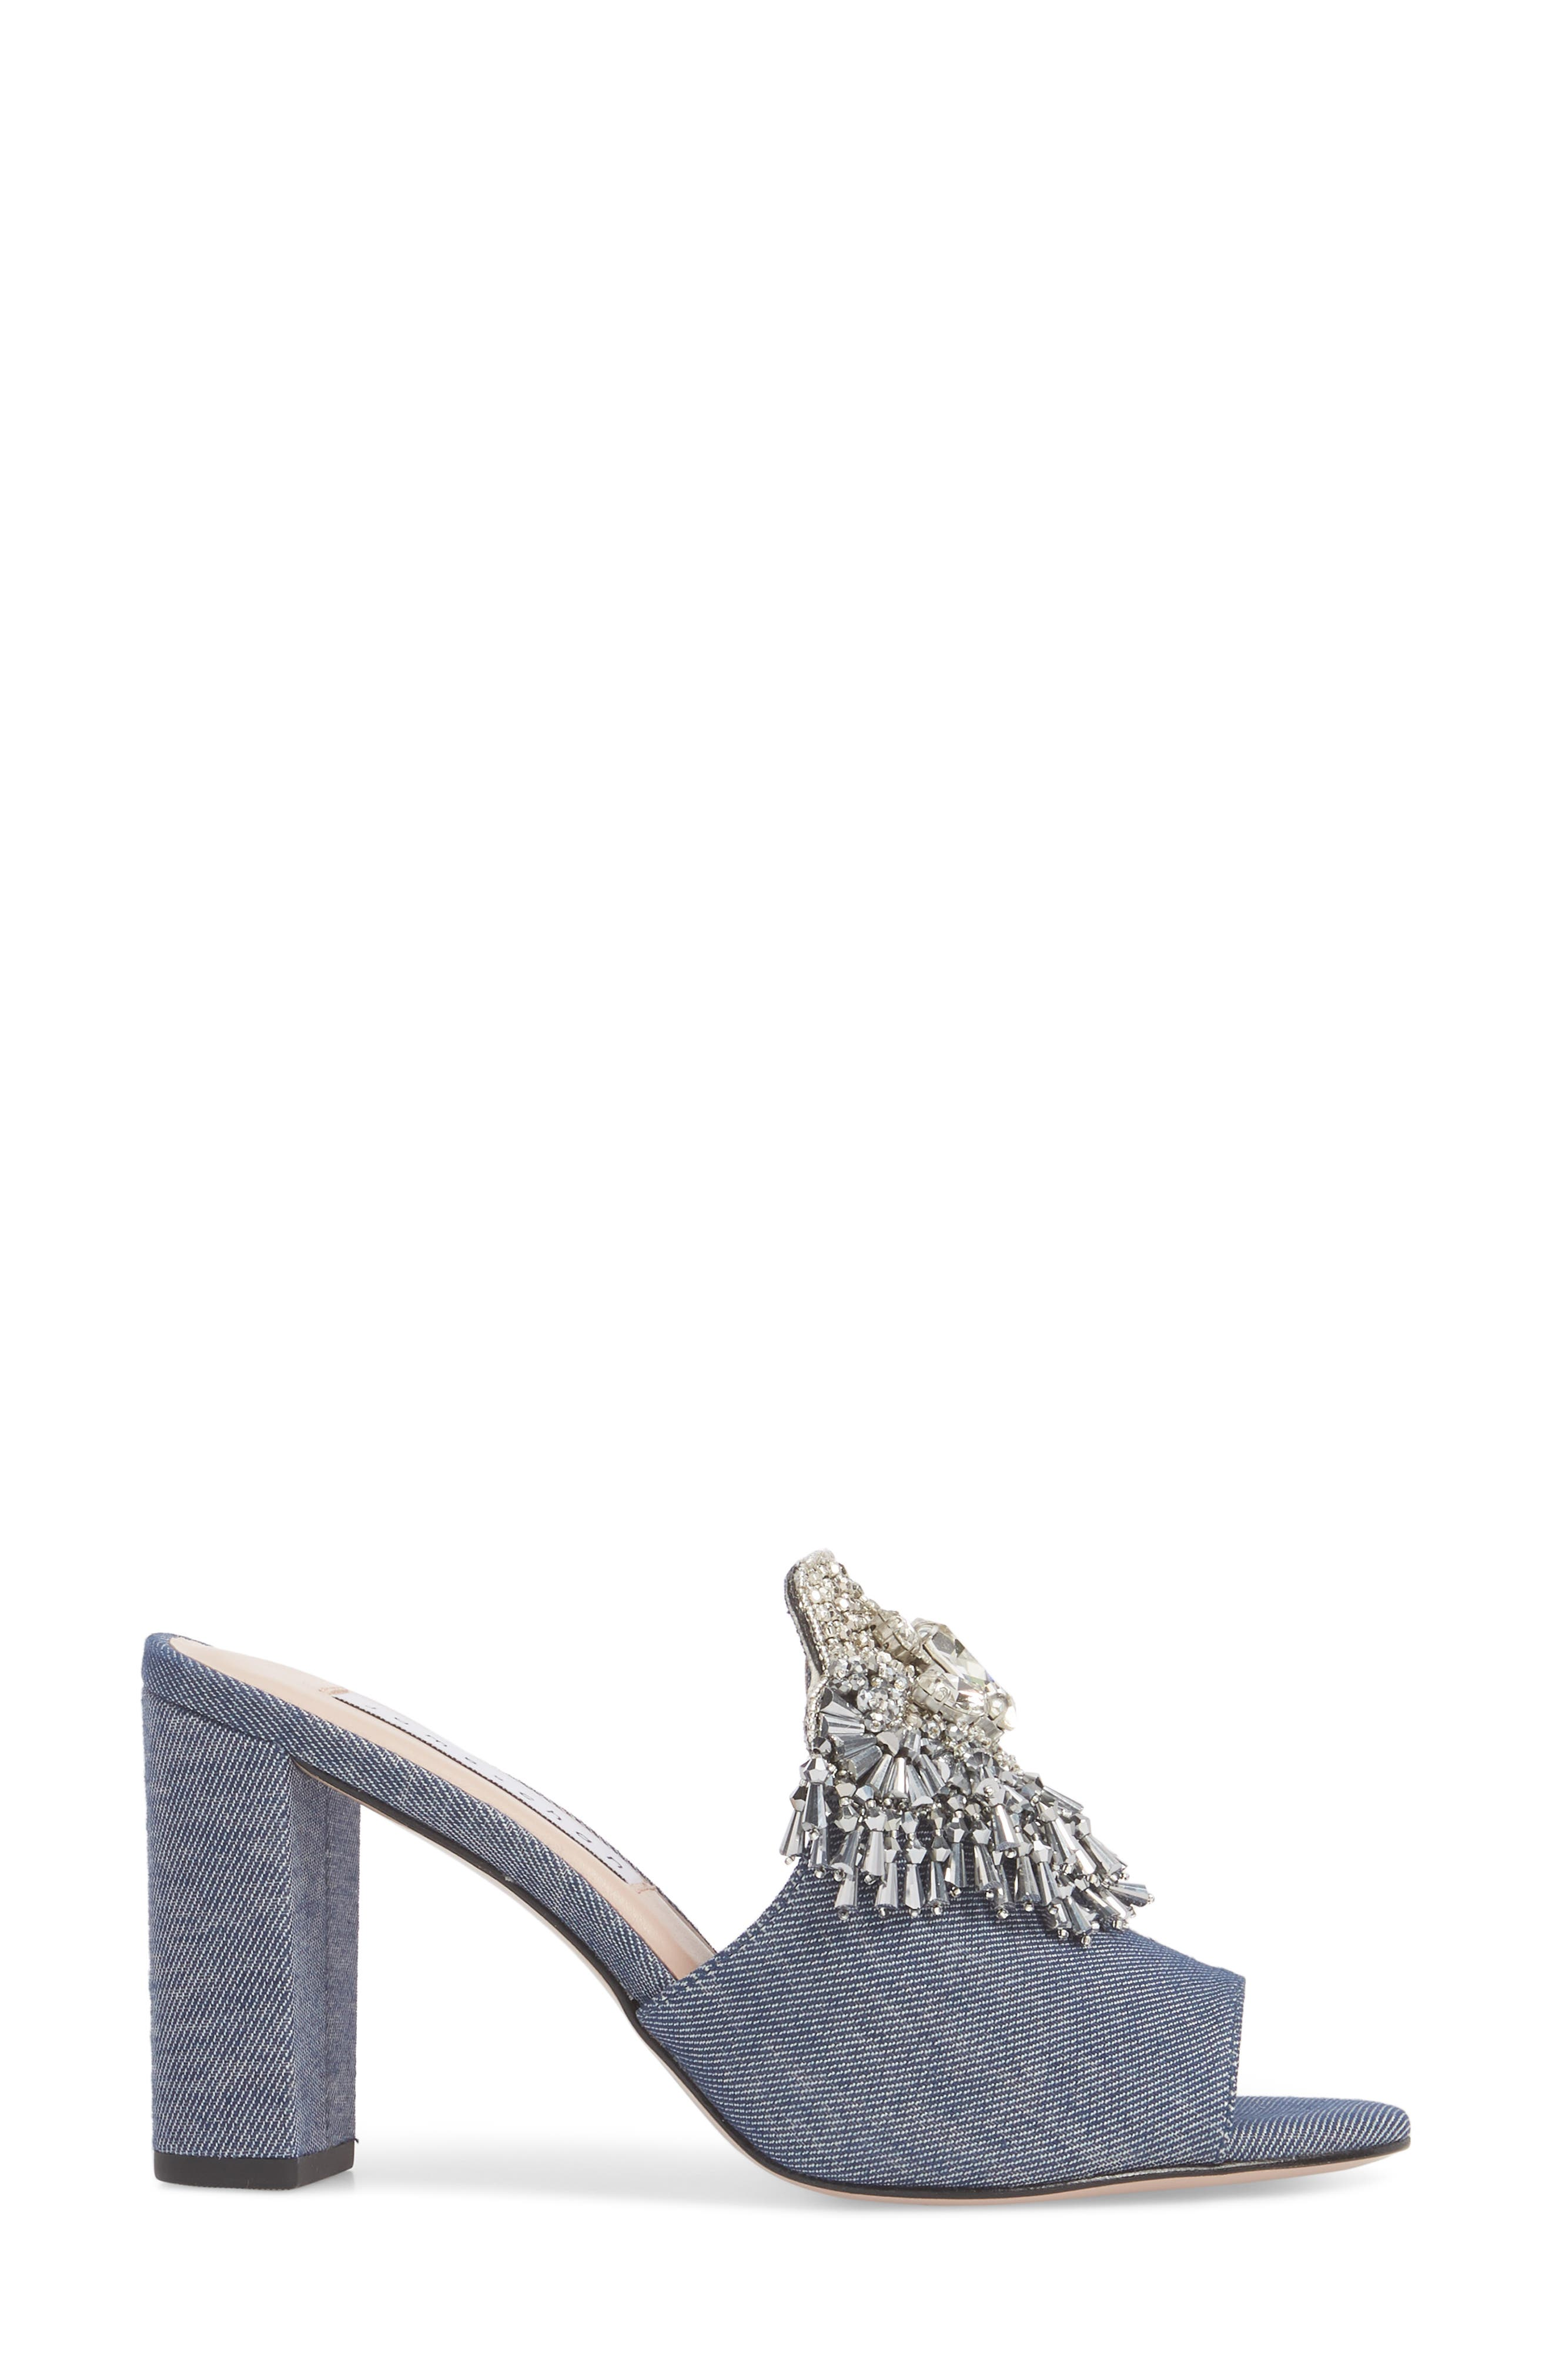 Adele Embellished Block Heel Sandal,                             Alternate thumbnail 3, color,                             Denim Patent